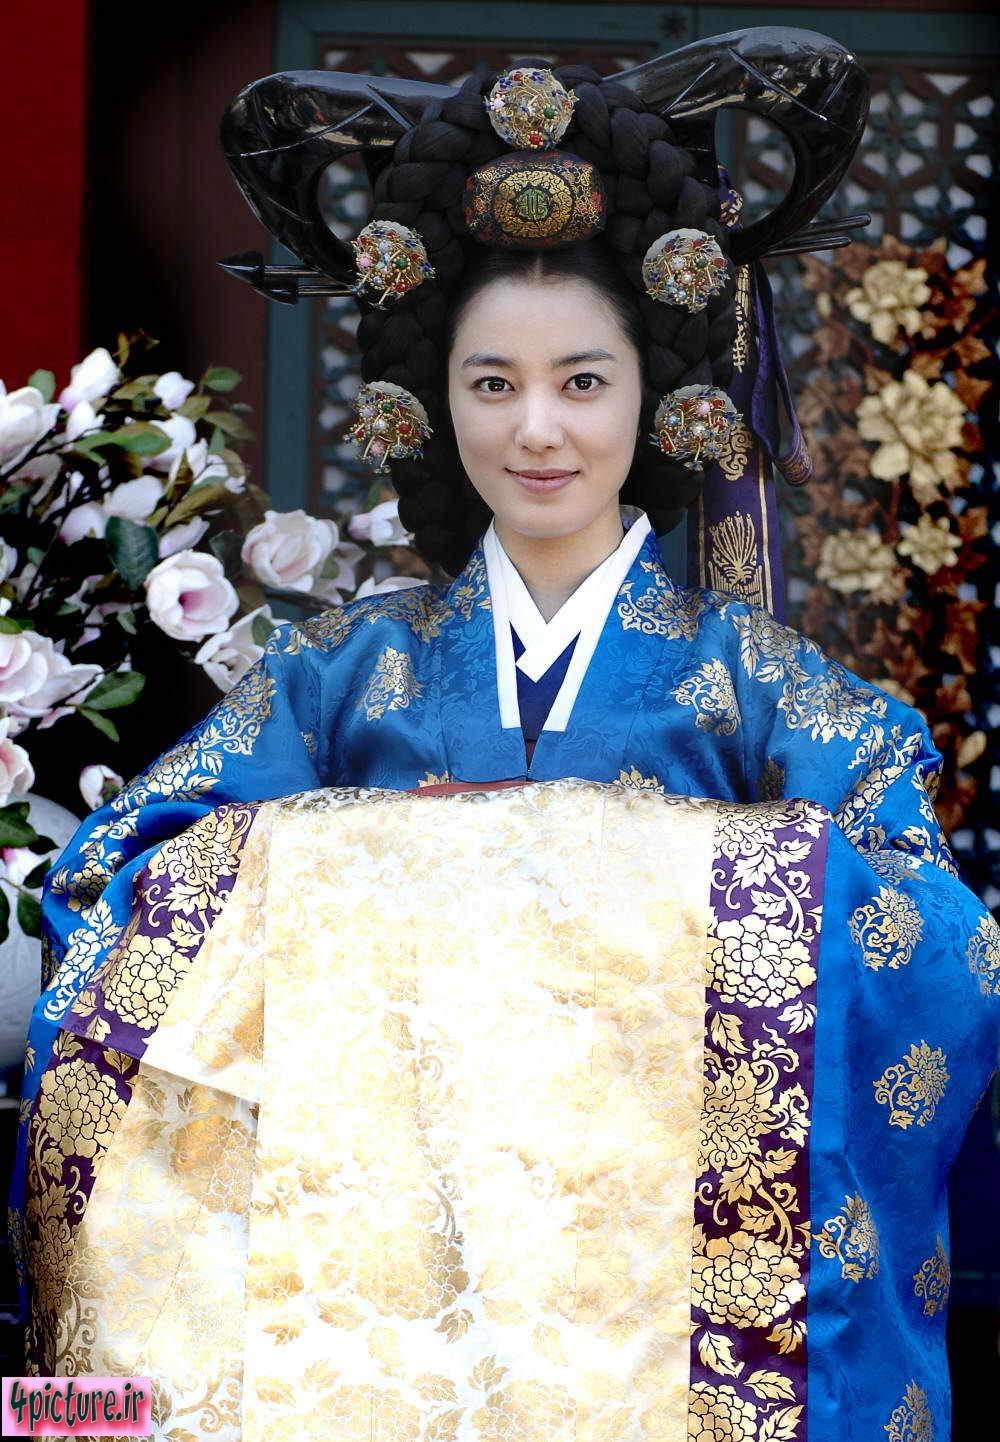 عکس بانو جانگ,عکس ملکه جانگ,Lee So-Yeon,Jang Hee-Bin